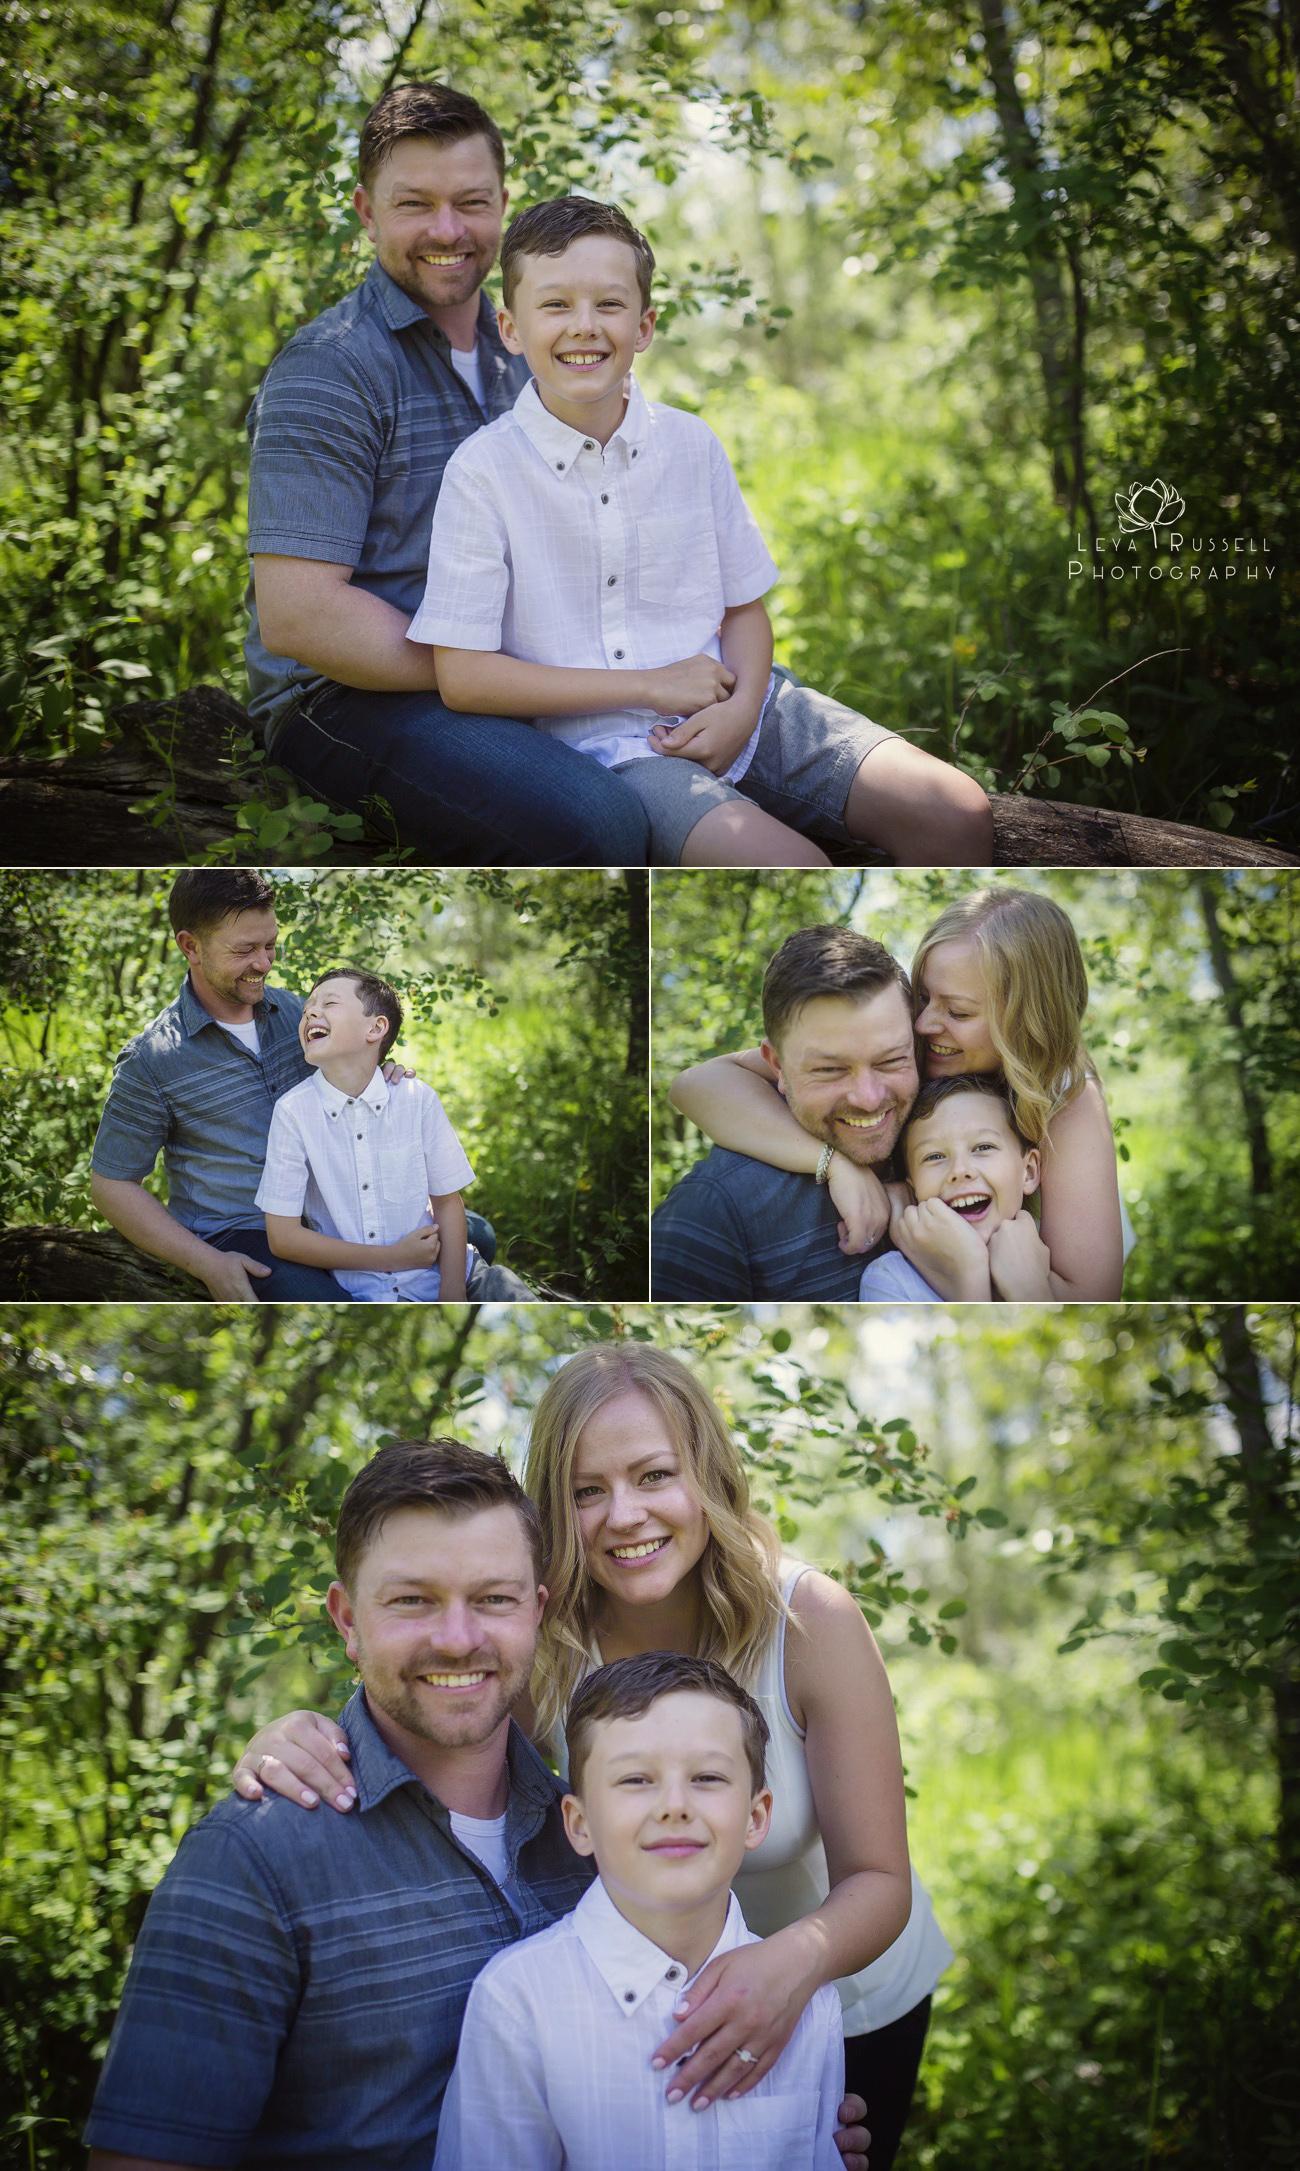 004-Kirsten & Mike S:P.jpg